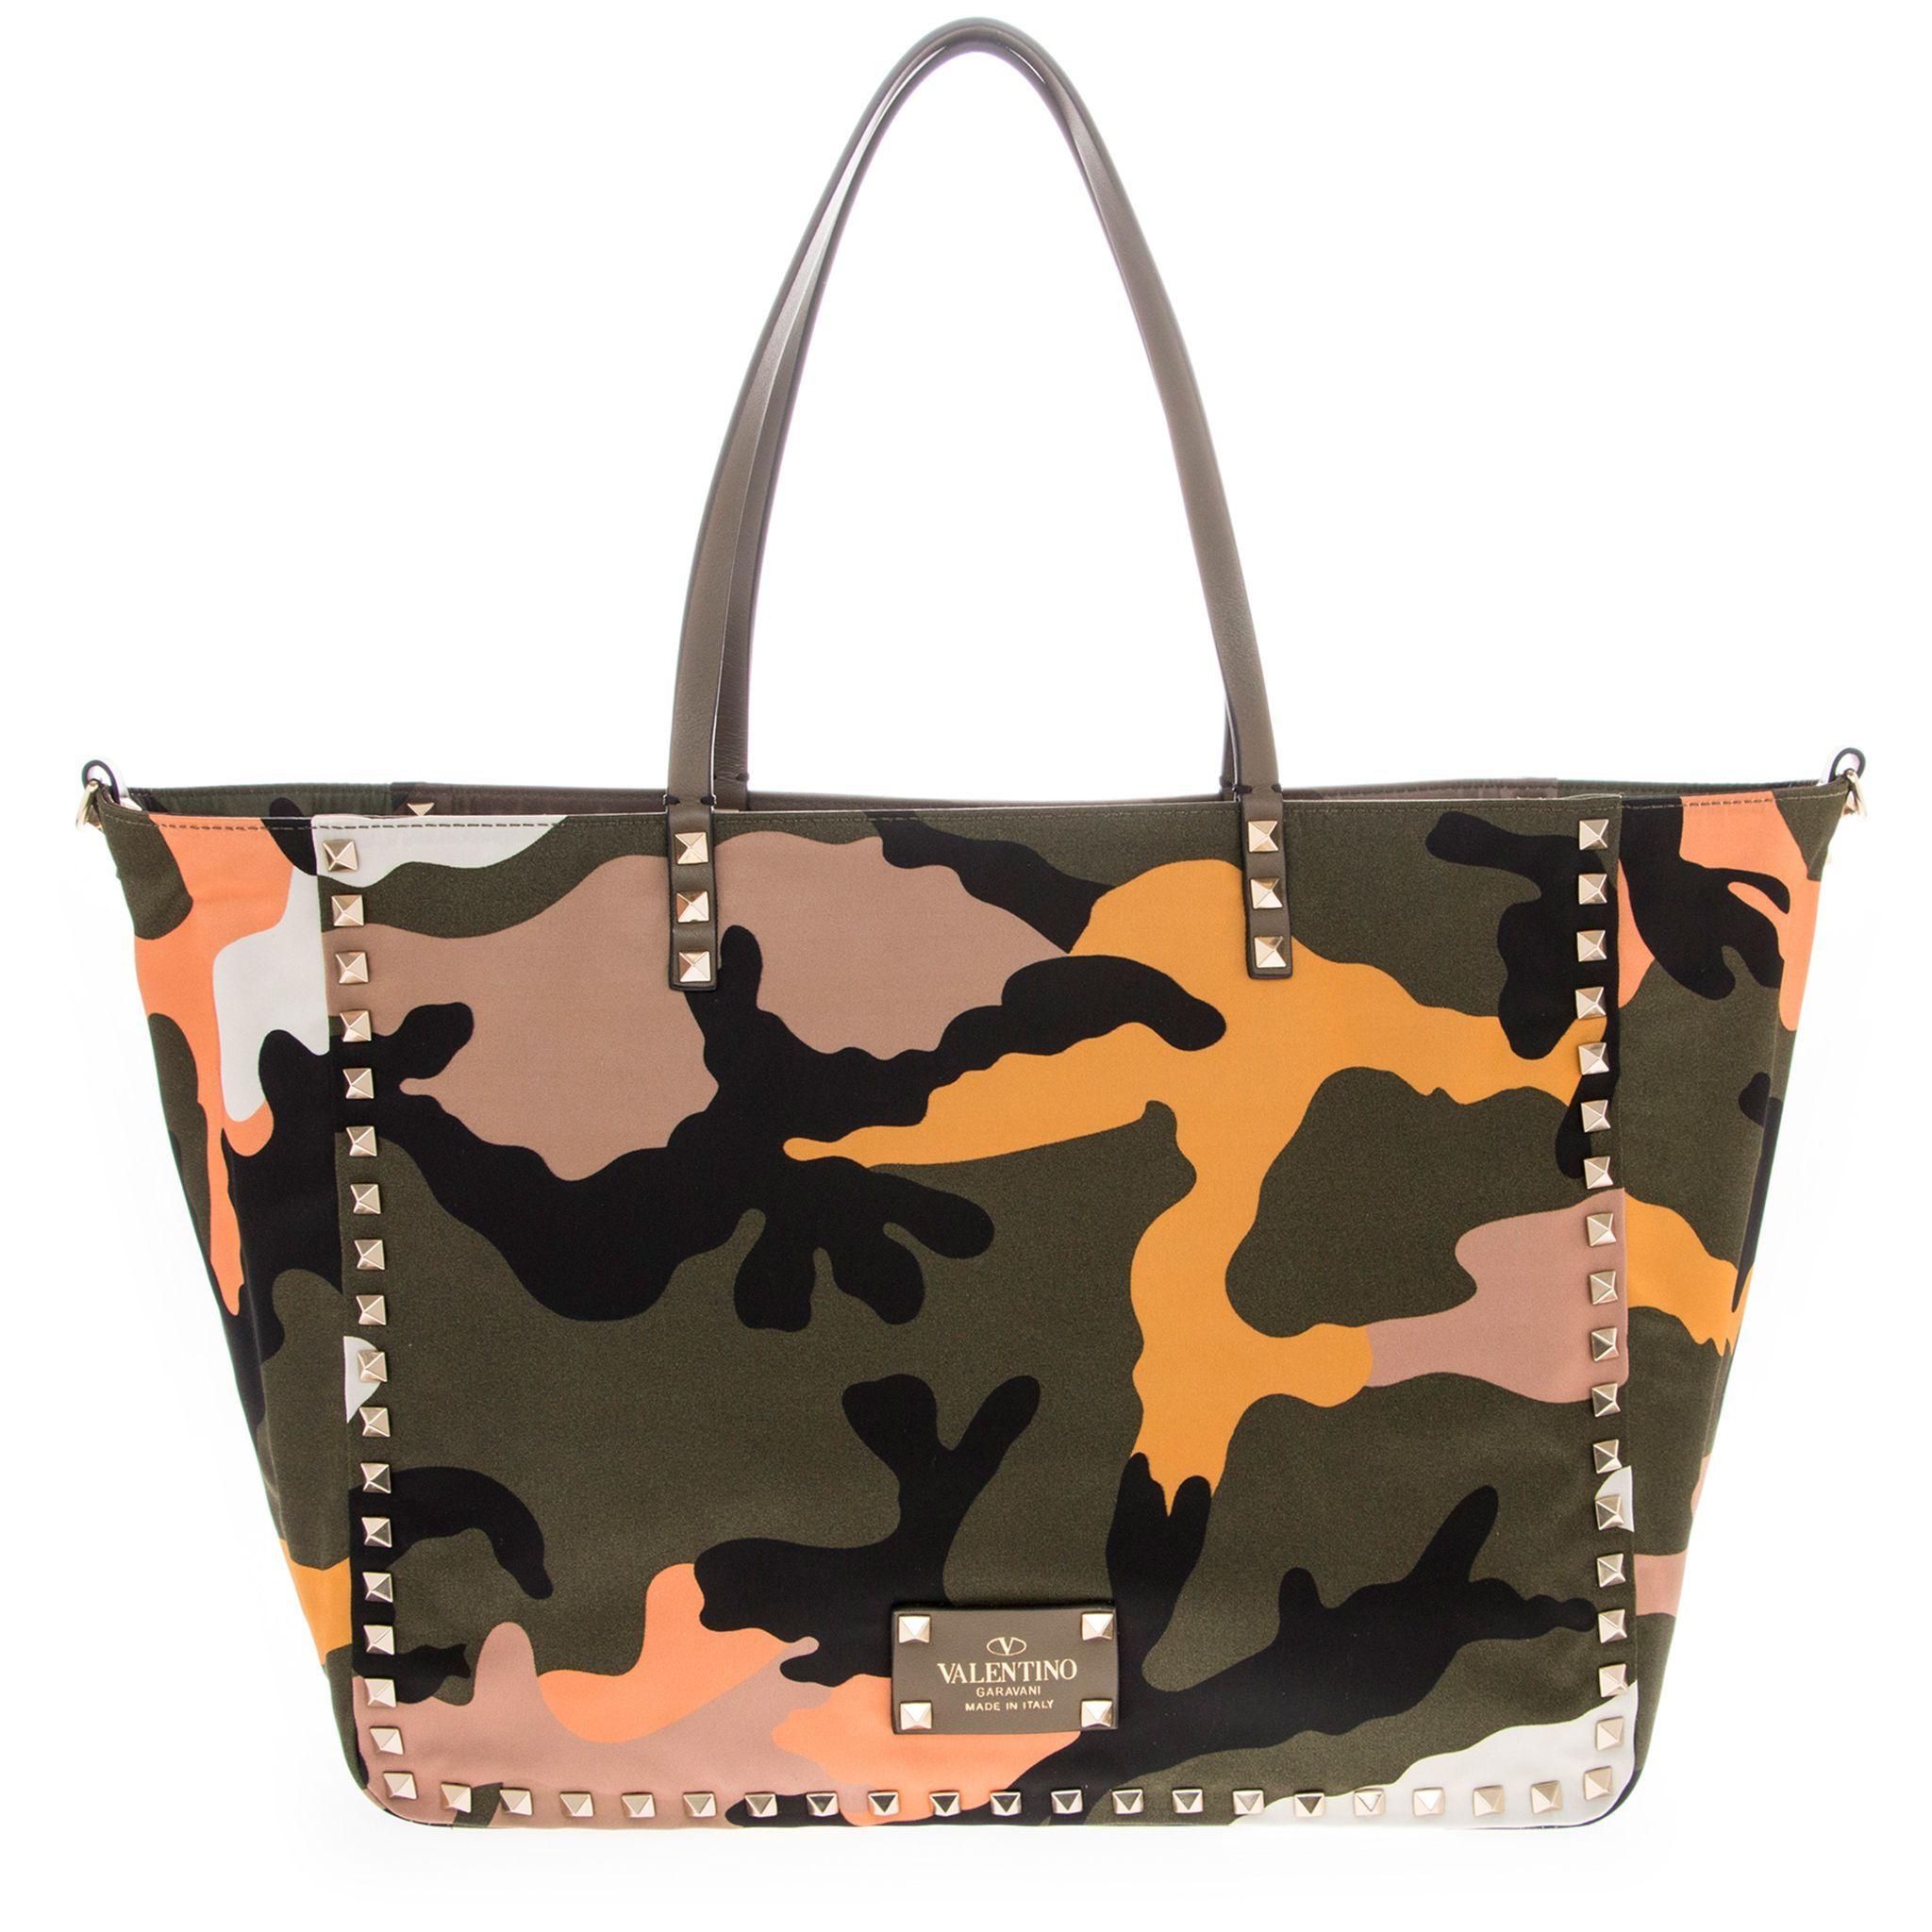 Valentino Rockstud Reversible Tote Bag Women's